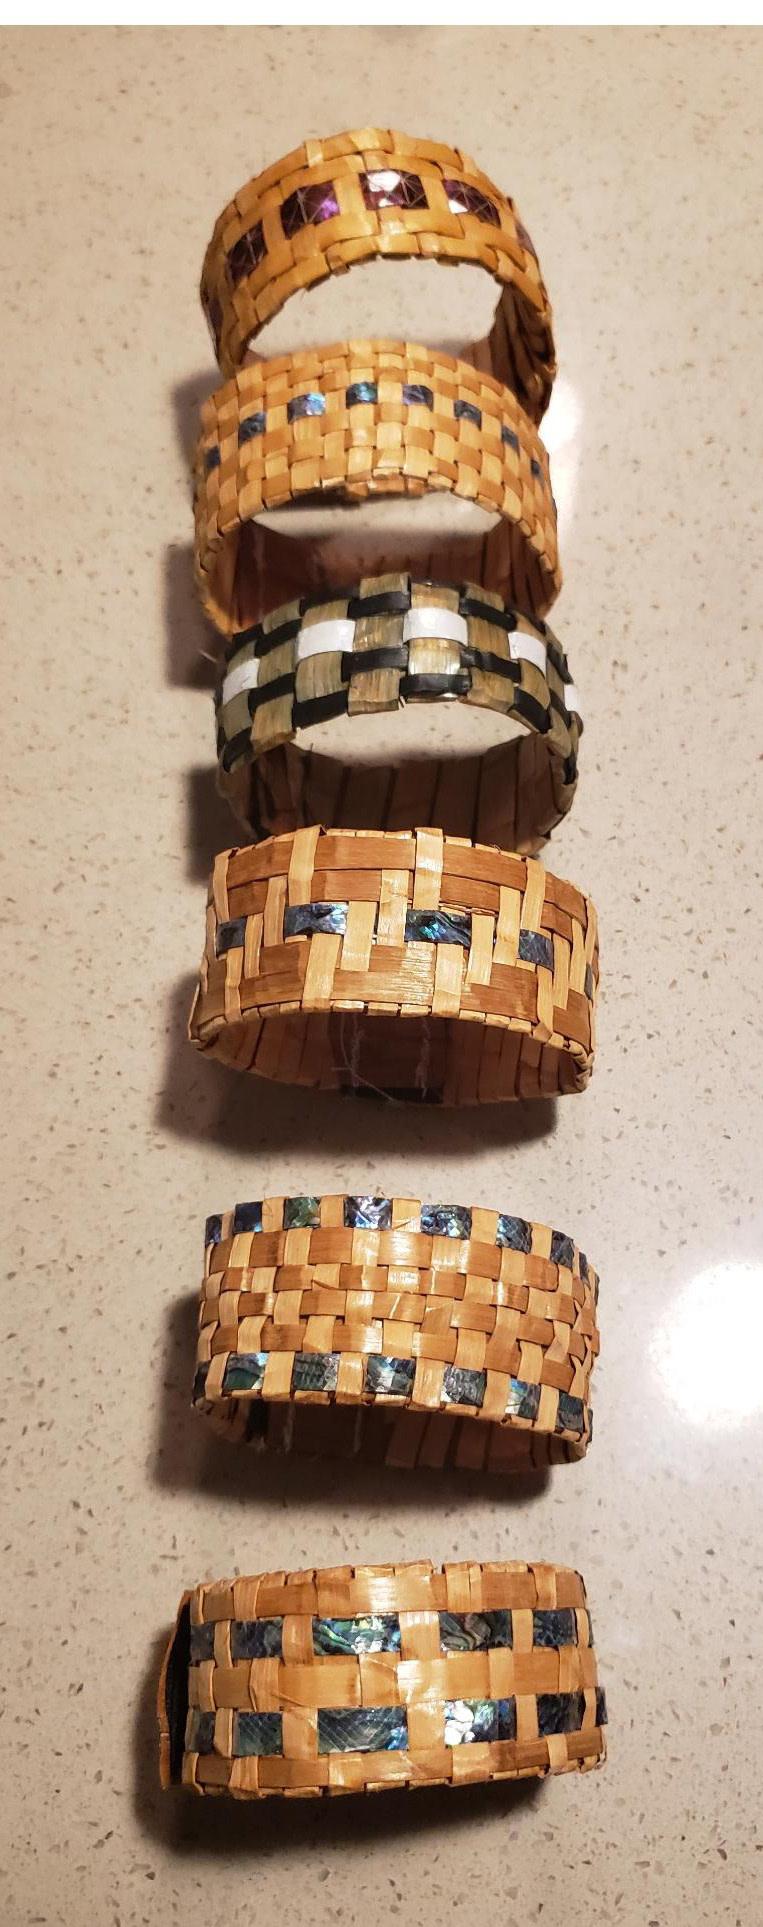 Cedar Bracelet with Abalone inlay- by C. Chapman-3